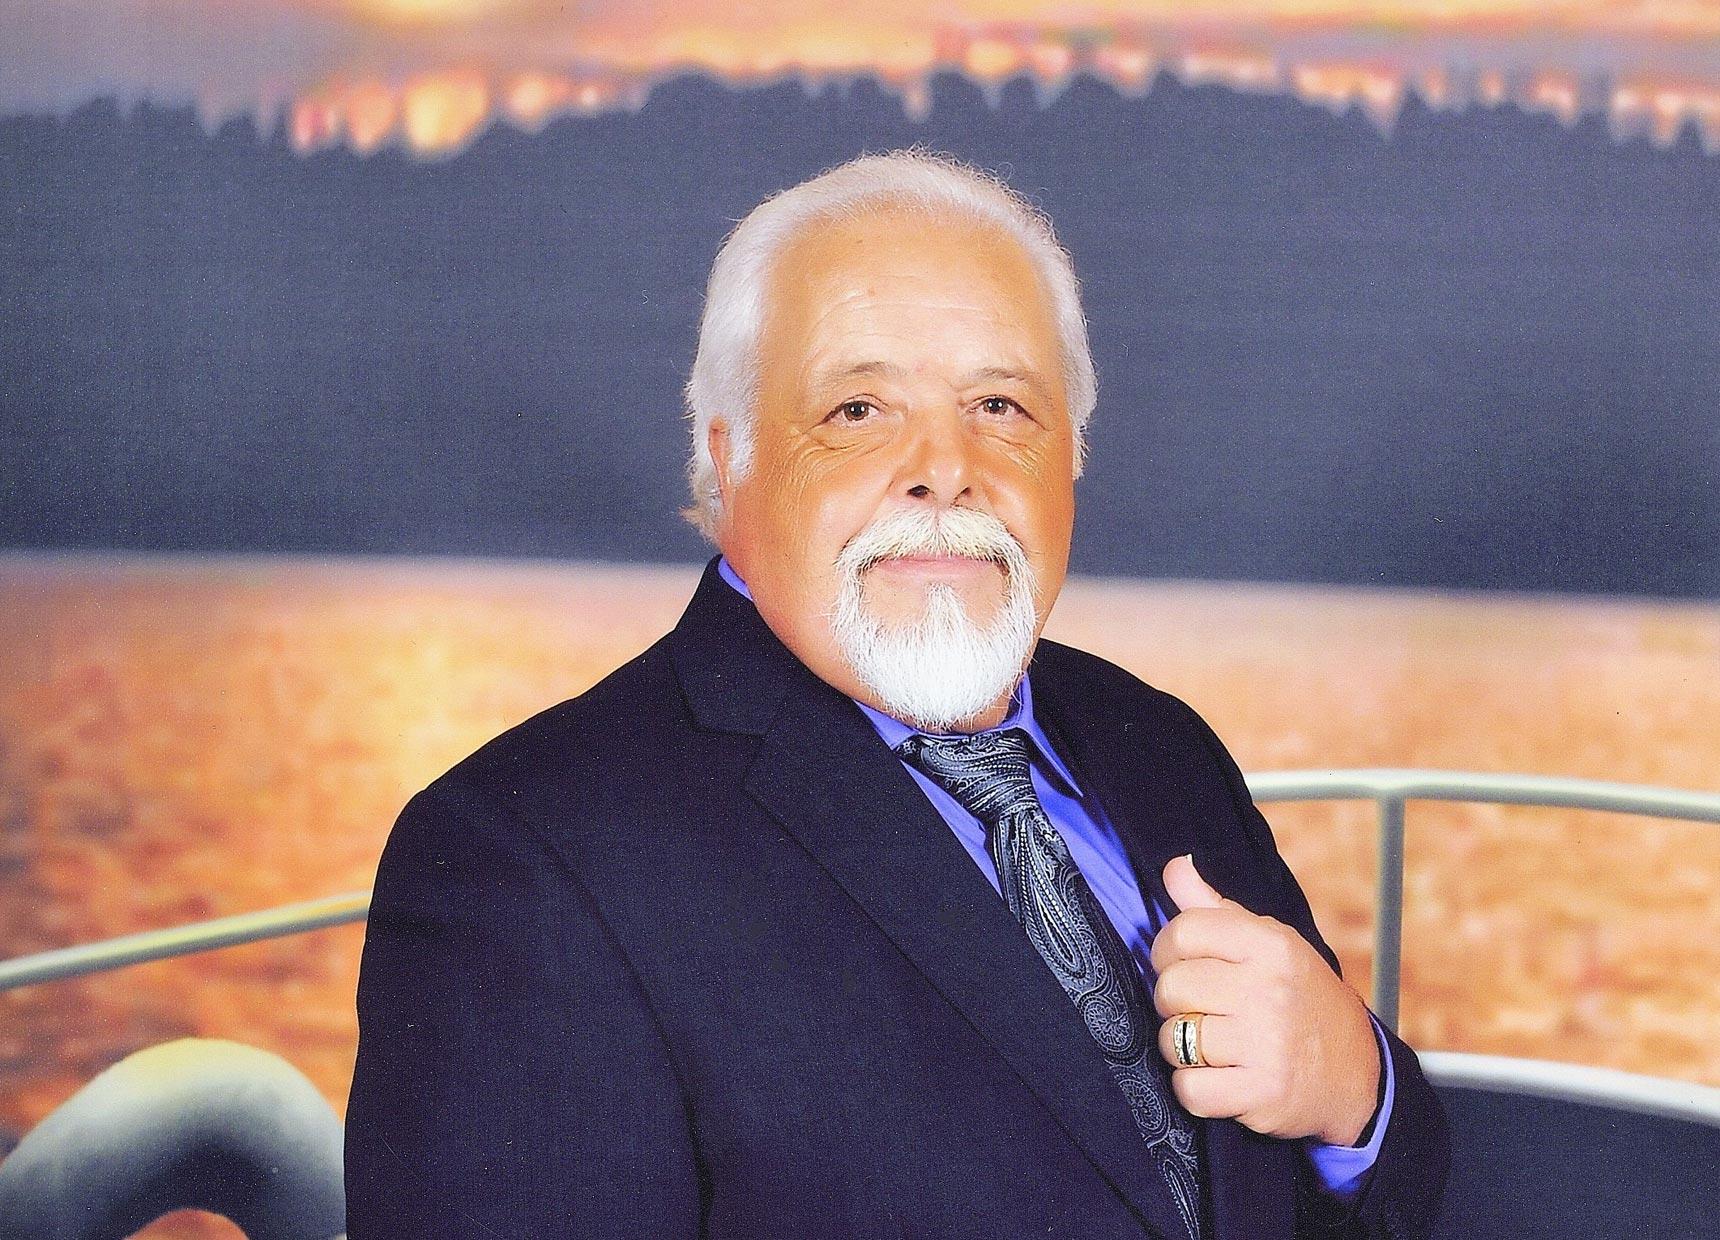 Paul Trupiano